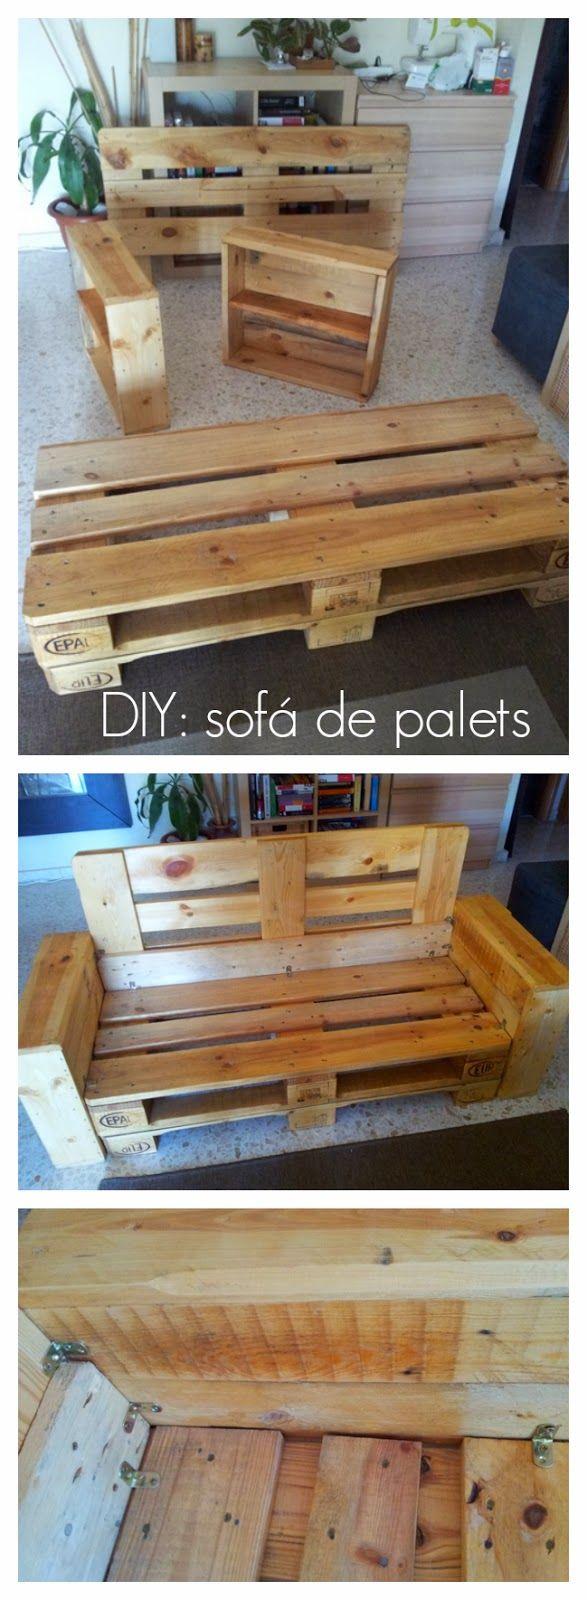 Diy c mo hacer un sof con palets x4duros bloglovin - Construir sofa con palets ...